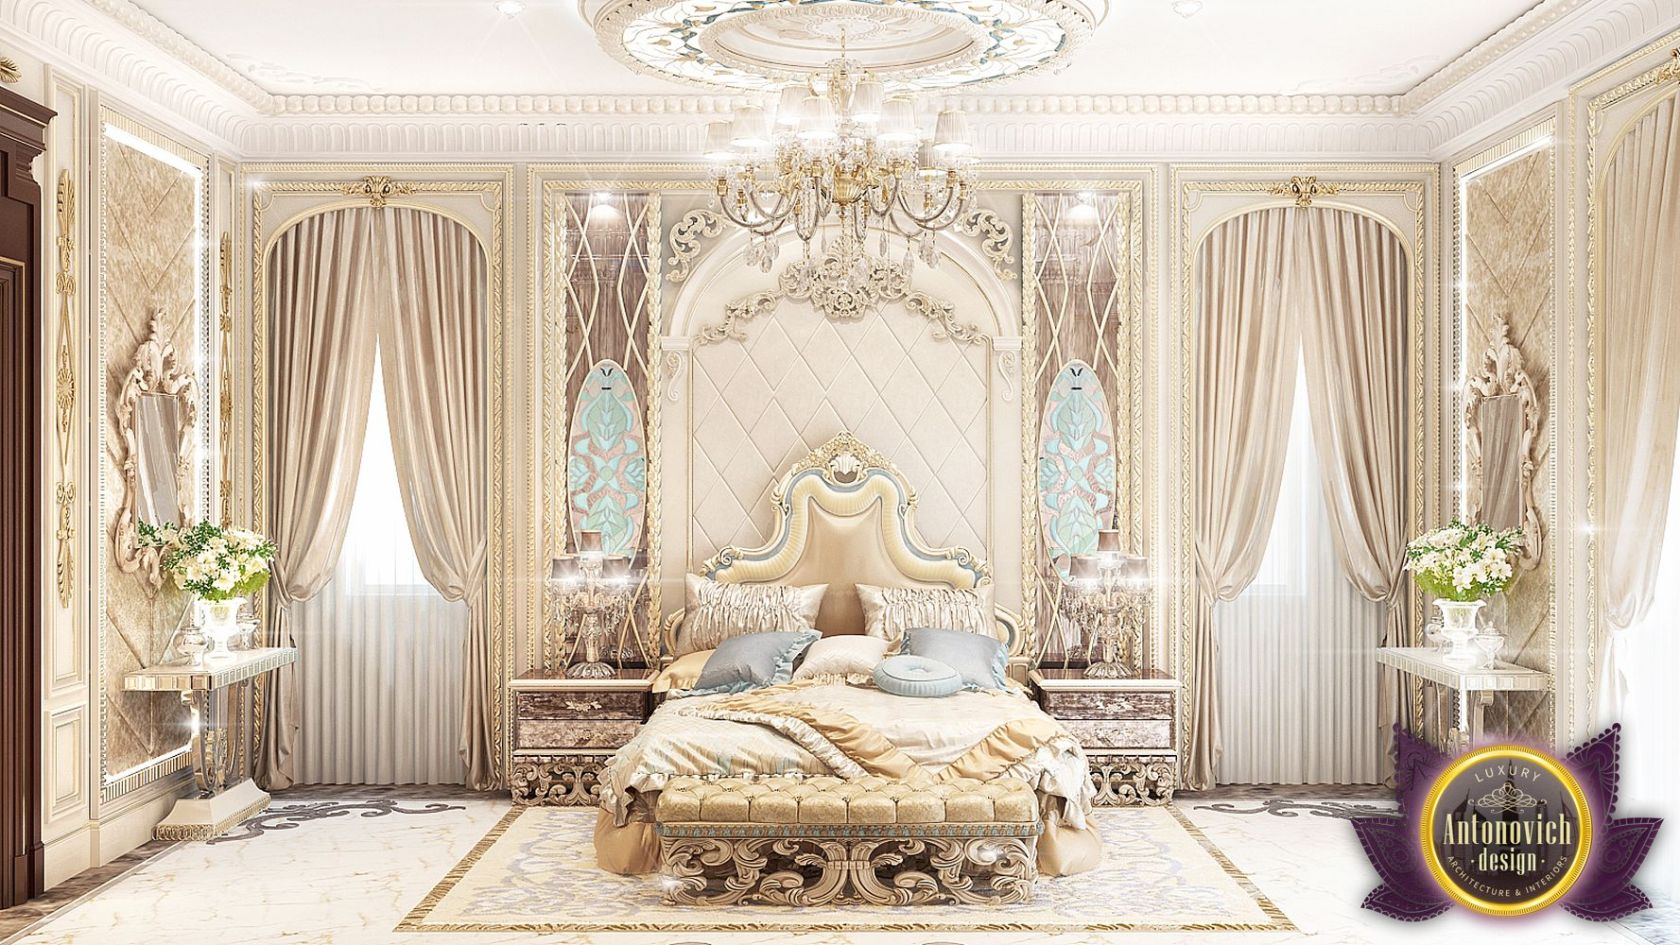 luxurious arabic style bedroom Luxury Royal Arabic Master Bedroom of Luxury Antonovich Design - Architizer